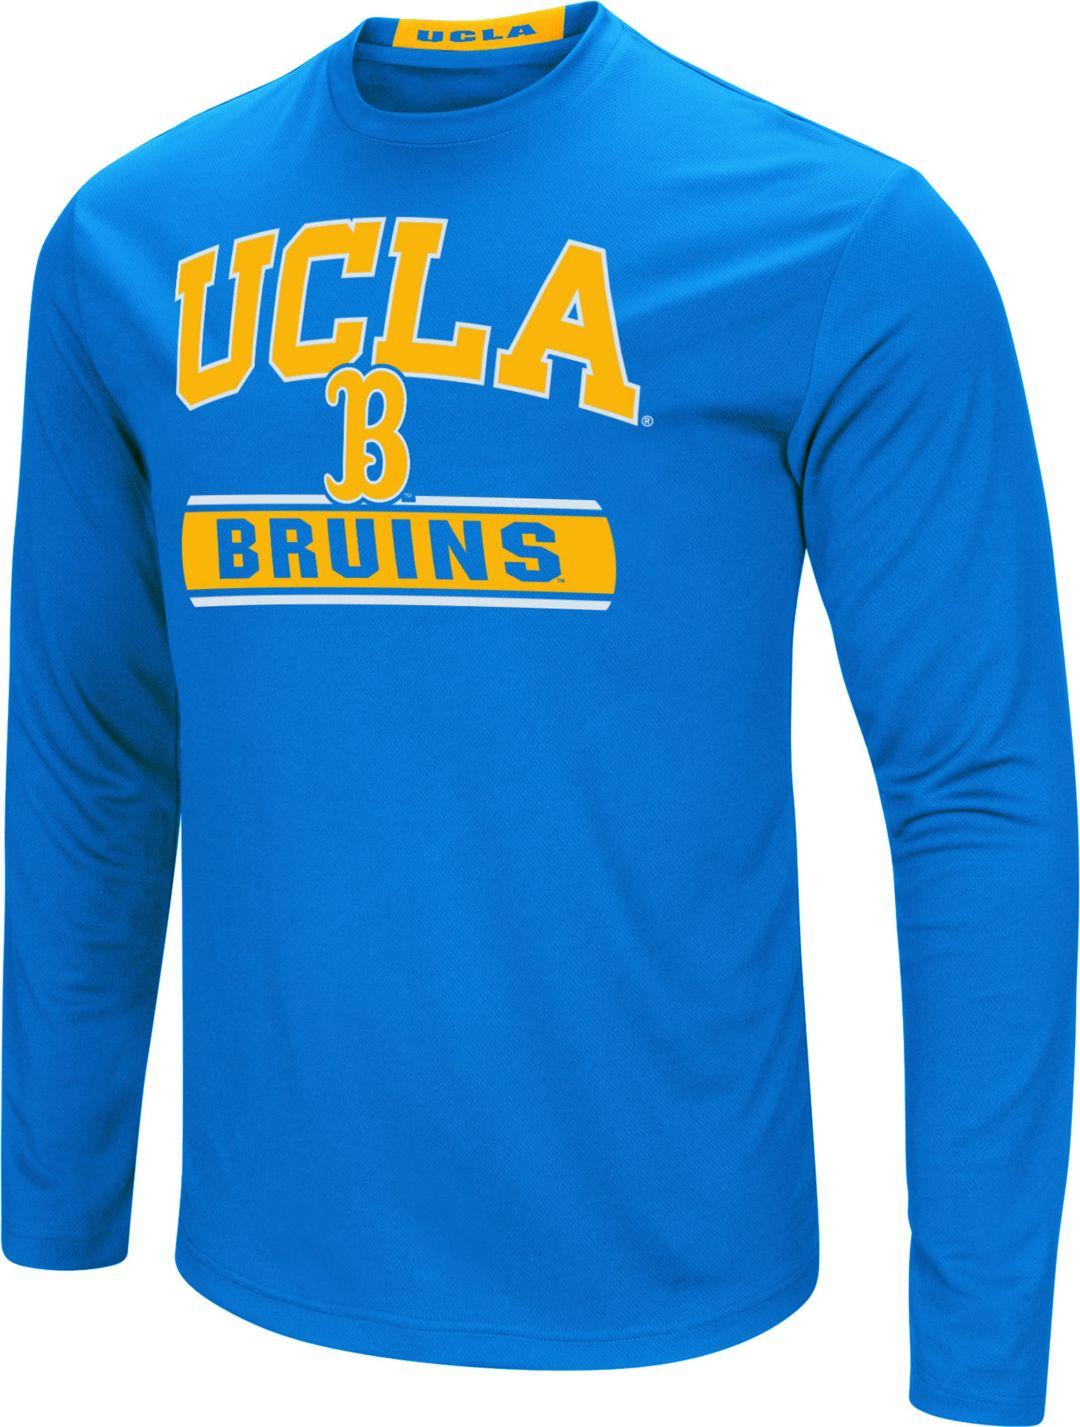 finest selection c077b adf6e Colosseum Men's UCLA Bruins True Blue Ganges Long Sleeve T-Shirt